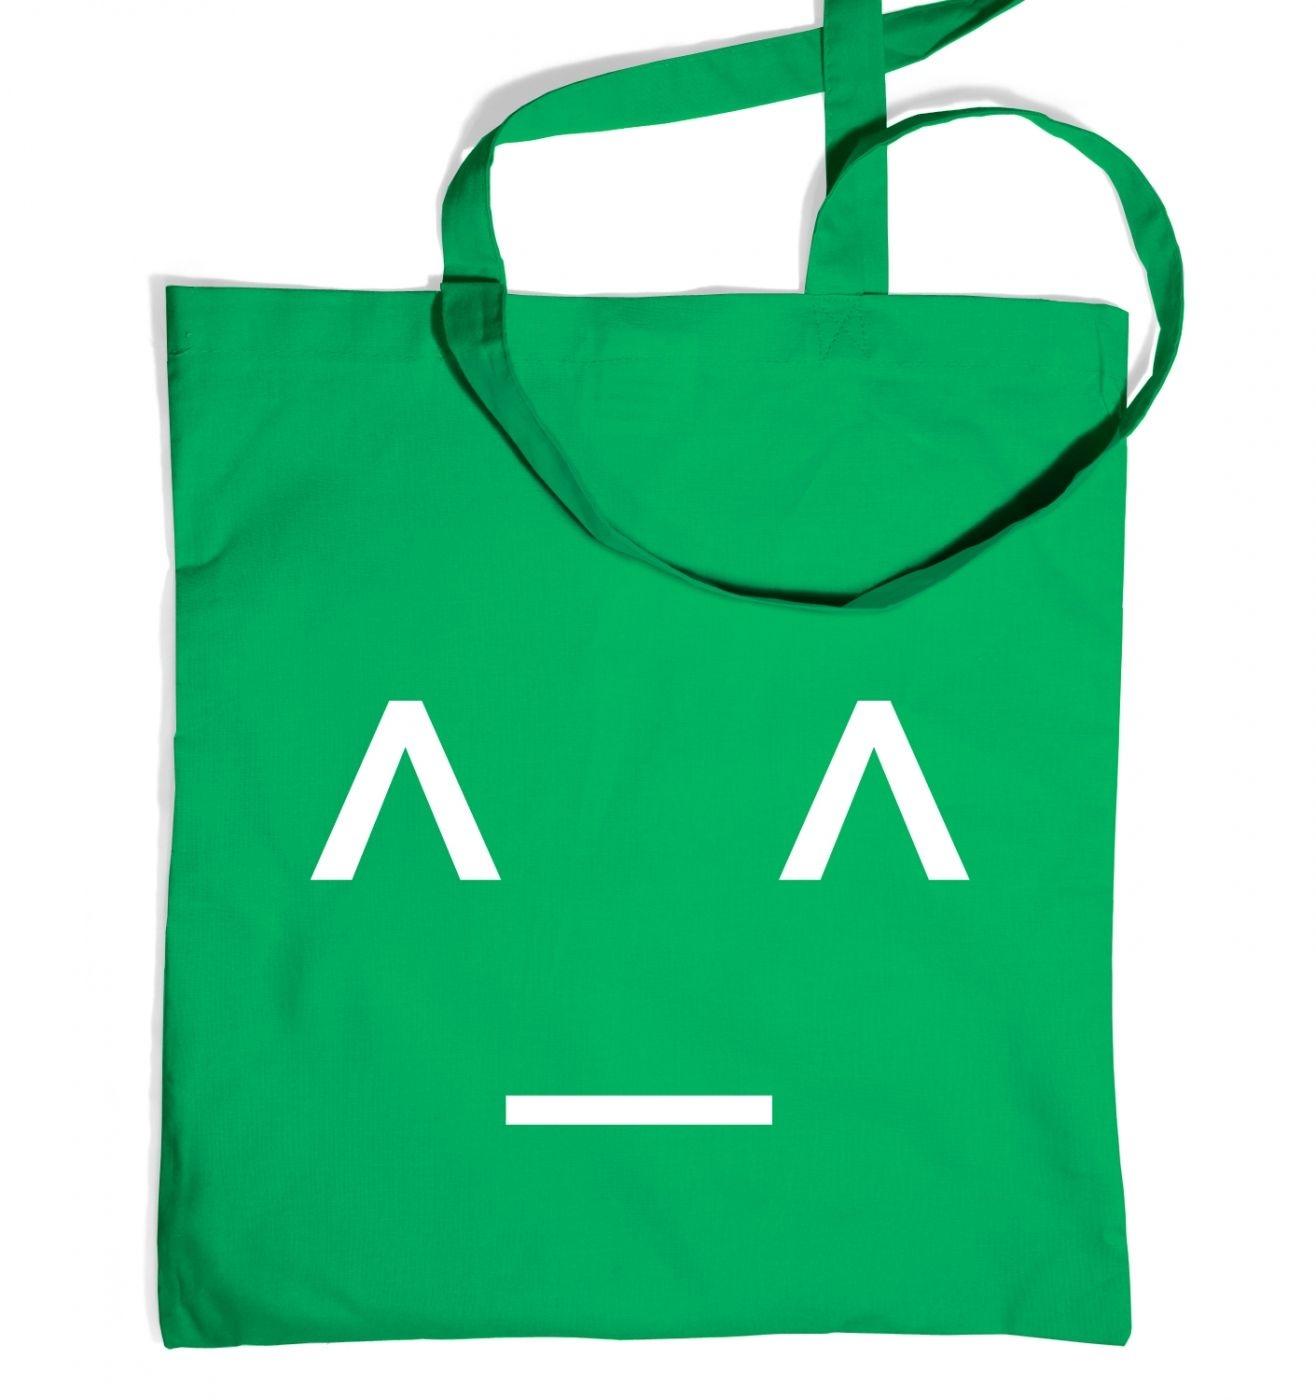 Japanese-Style Happy Emoticon bag